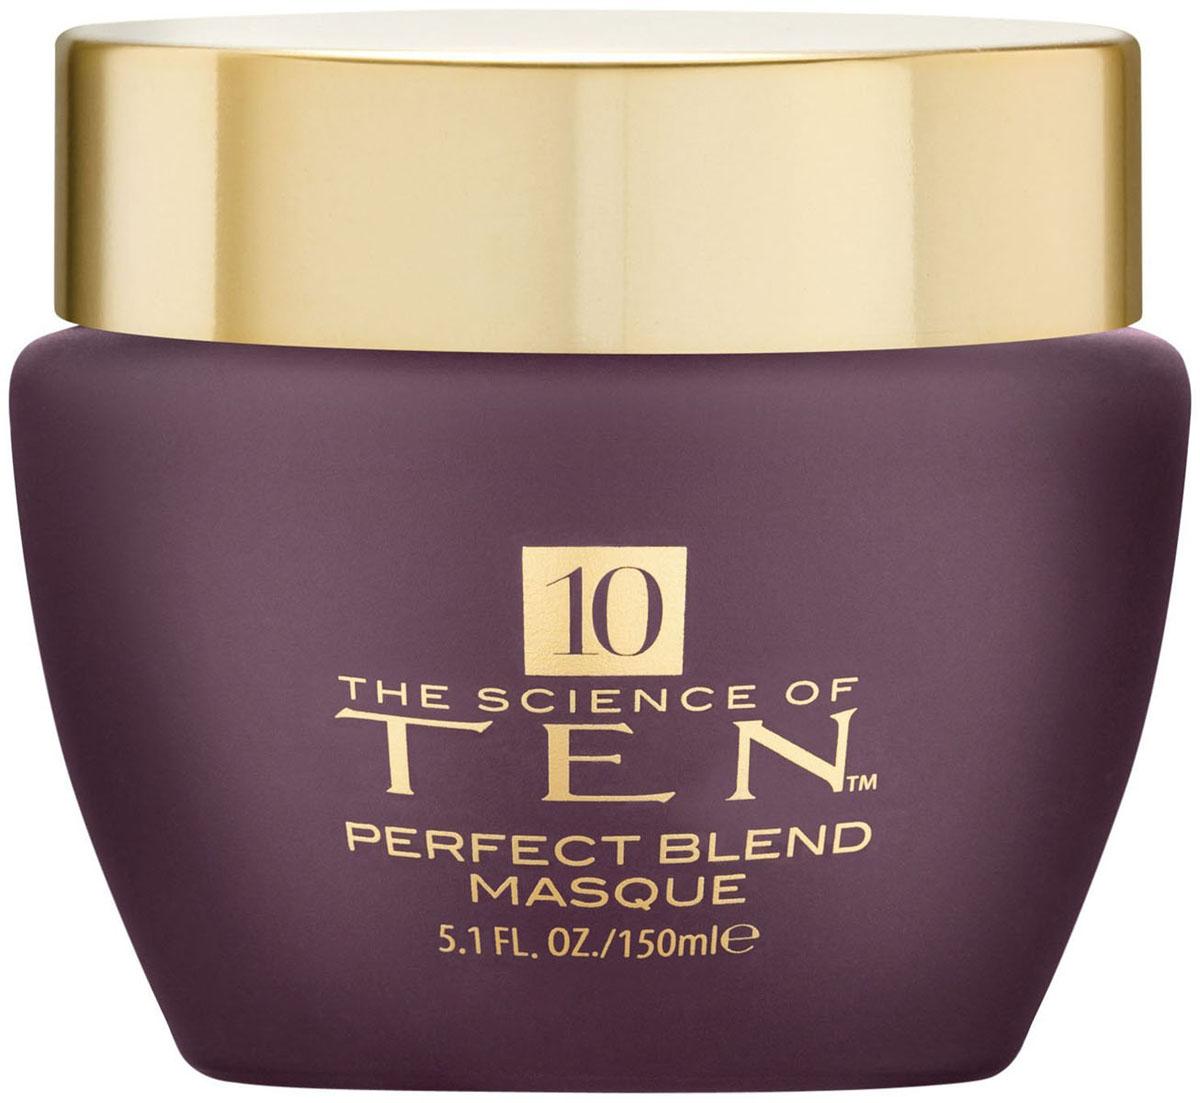 Alterna Маска для волос Совершенная формула Luxury Ten The Science of Ten Hair Masque - 150 мл